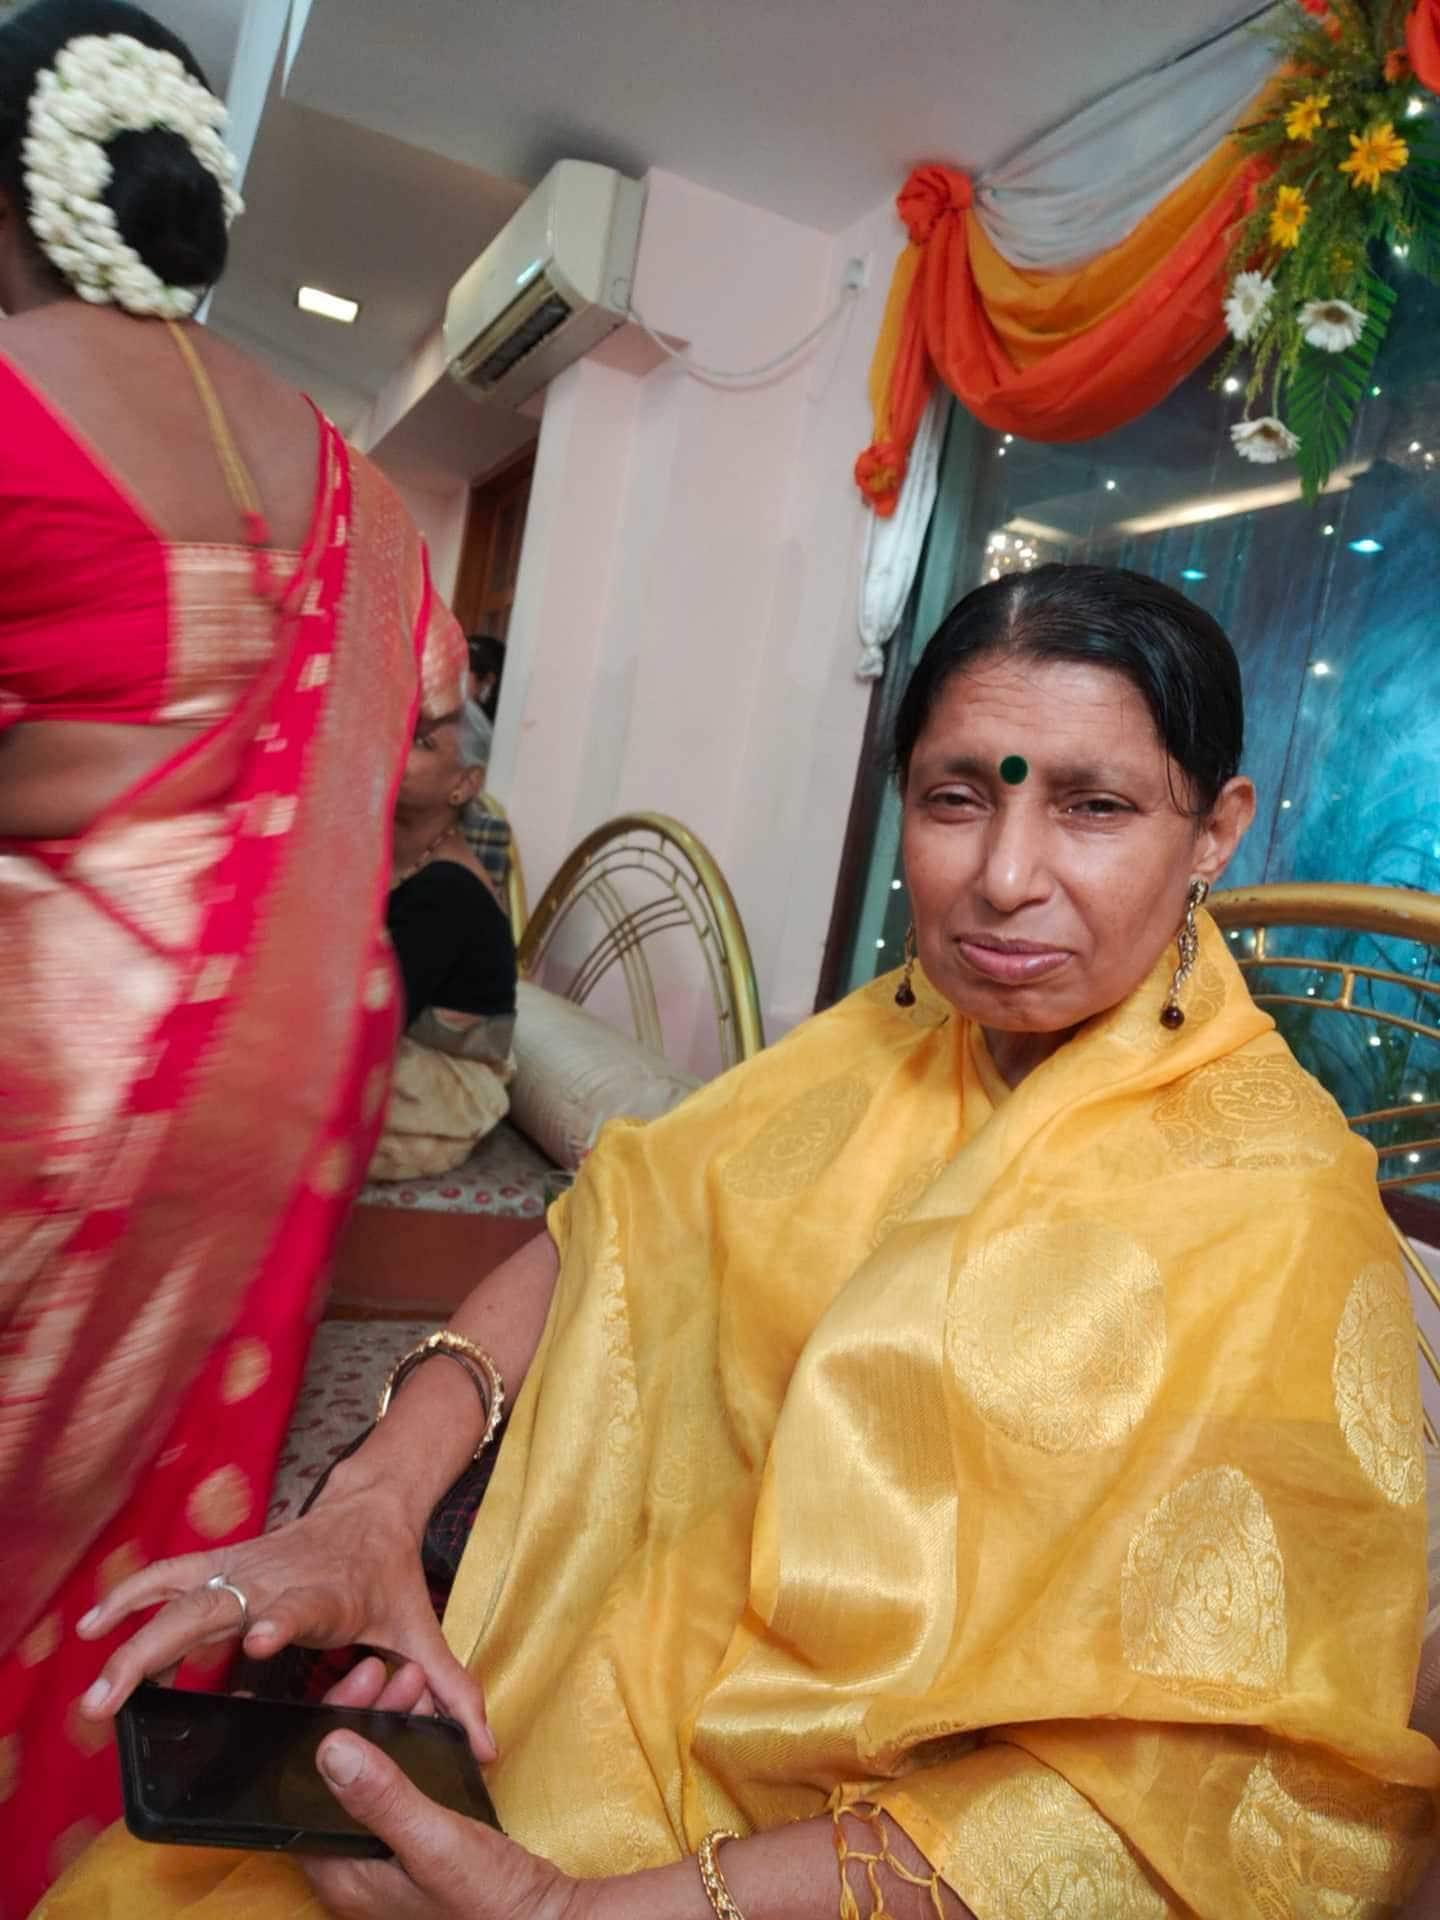 Top 100 Marriage Bureau in Sonarpur, Kolkata - Best Tamil Matrimony